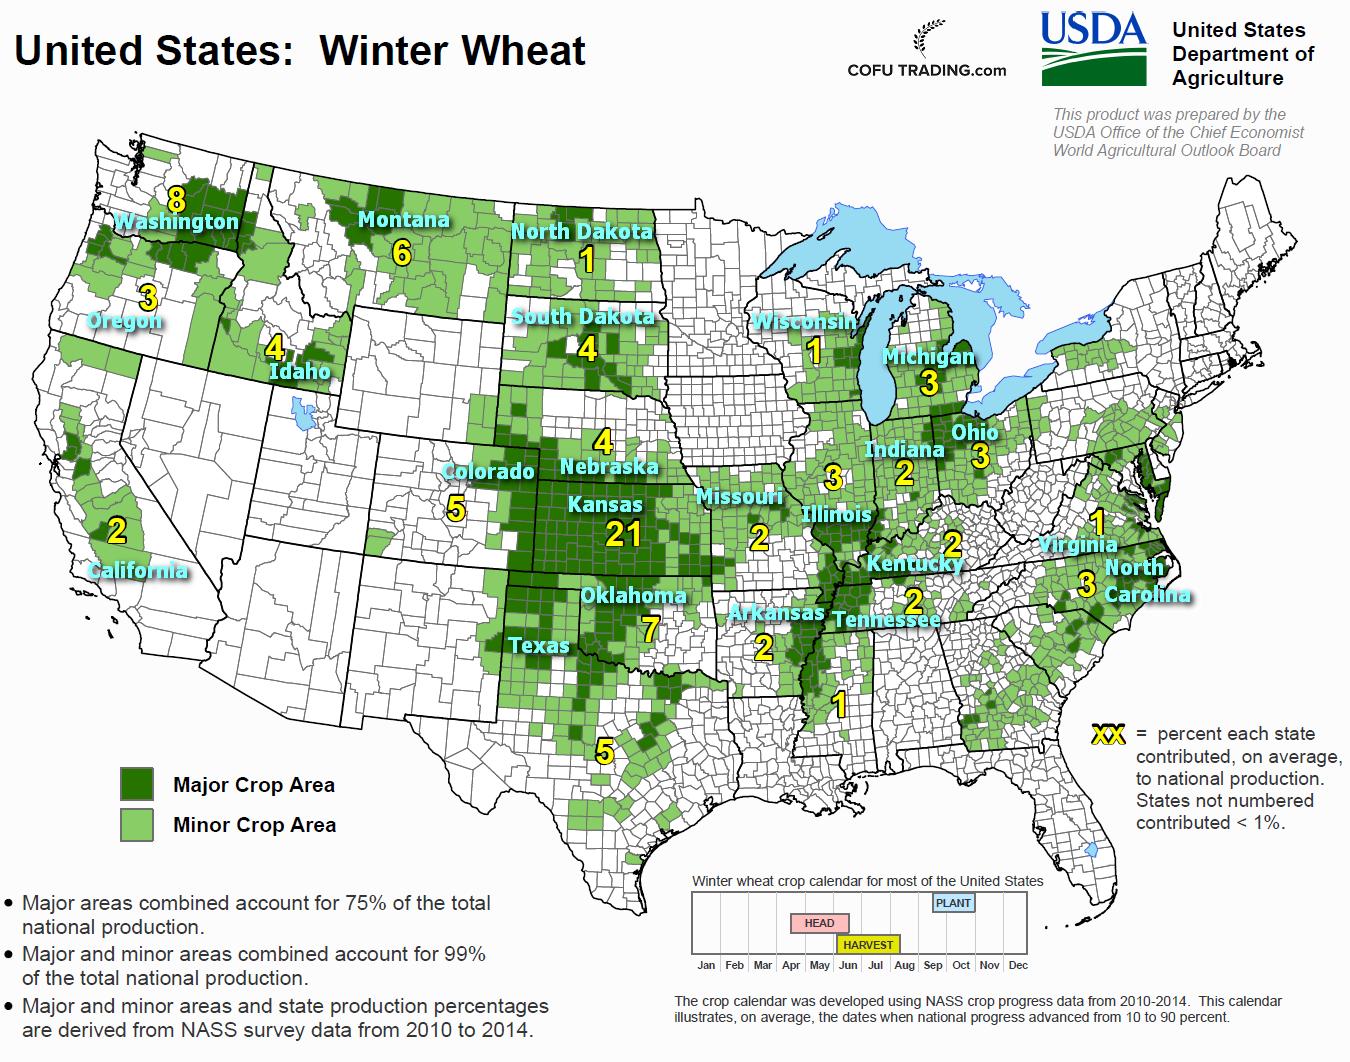 U.S. Winter Wheat Crop Map.png